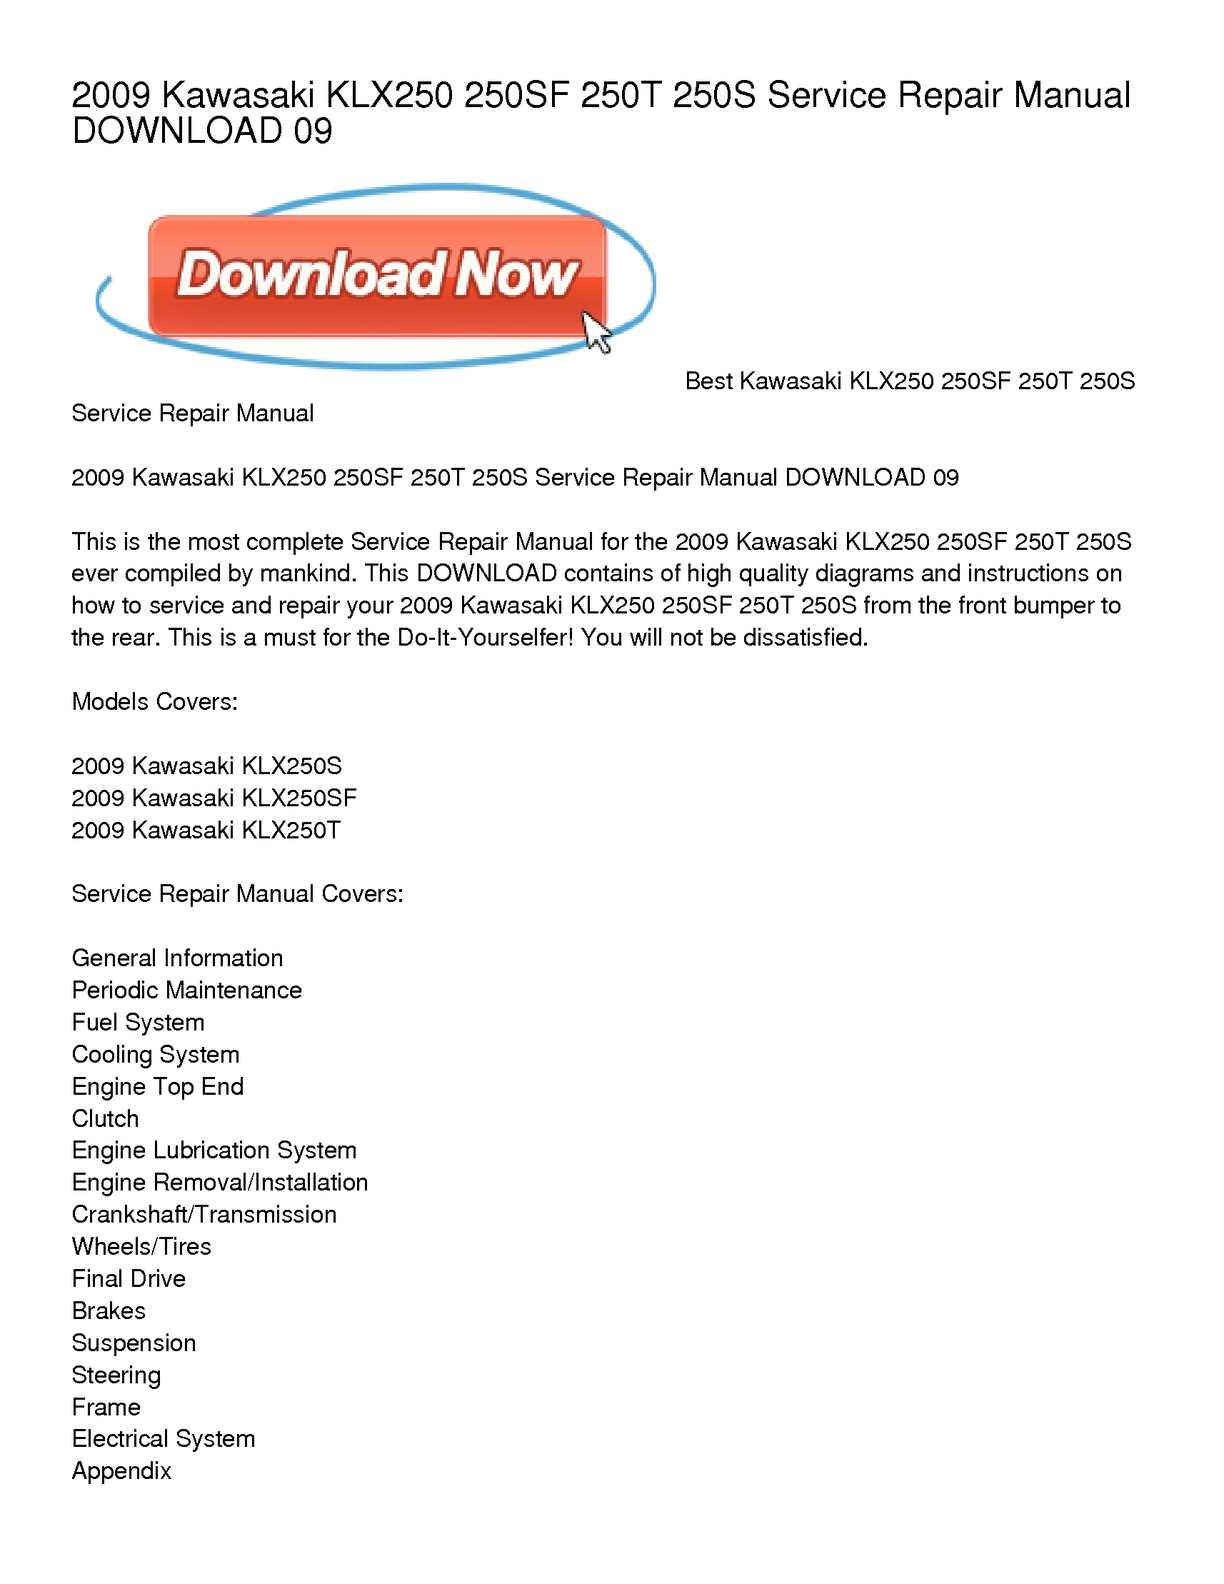 Calaméo - 2009 Kawasaki KLX250 250SF 250T 250S Service Repair Manual  DOWNLOAD 09